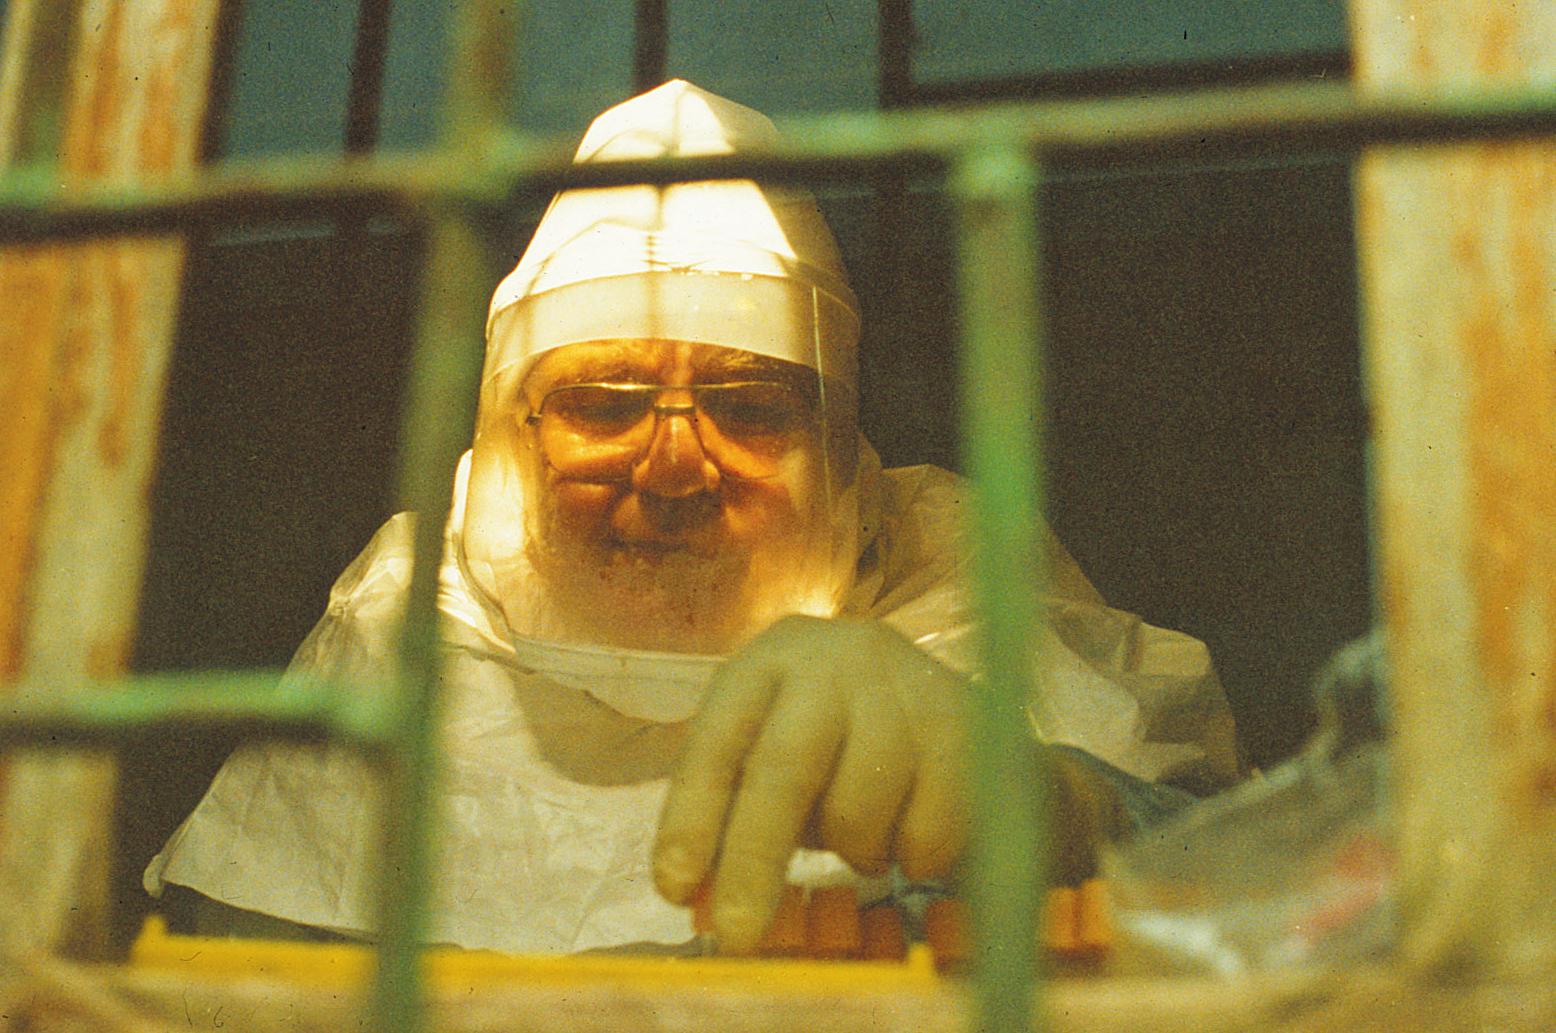 Robert-Swanepol-in-ad-hoc-BSL4-lab-in-Kikwit-1994--LG-(deleted-4db1d711-93fe5c-77d5b099).jpg